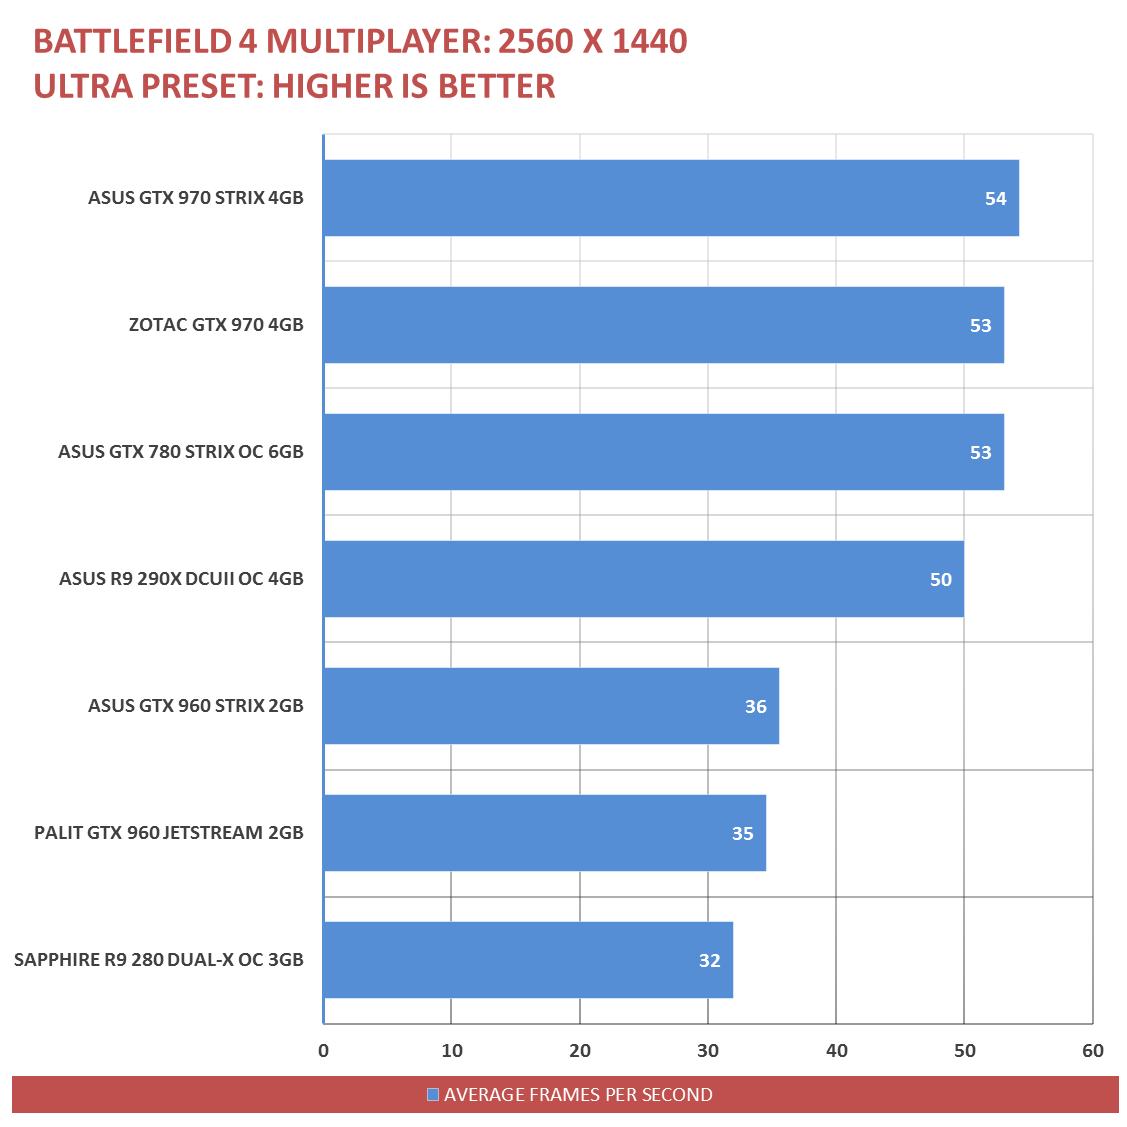 ASUS-GTX-960-STRIX-Benchmarks-15